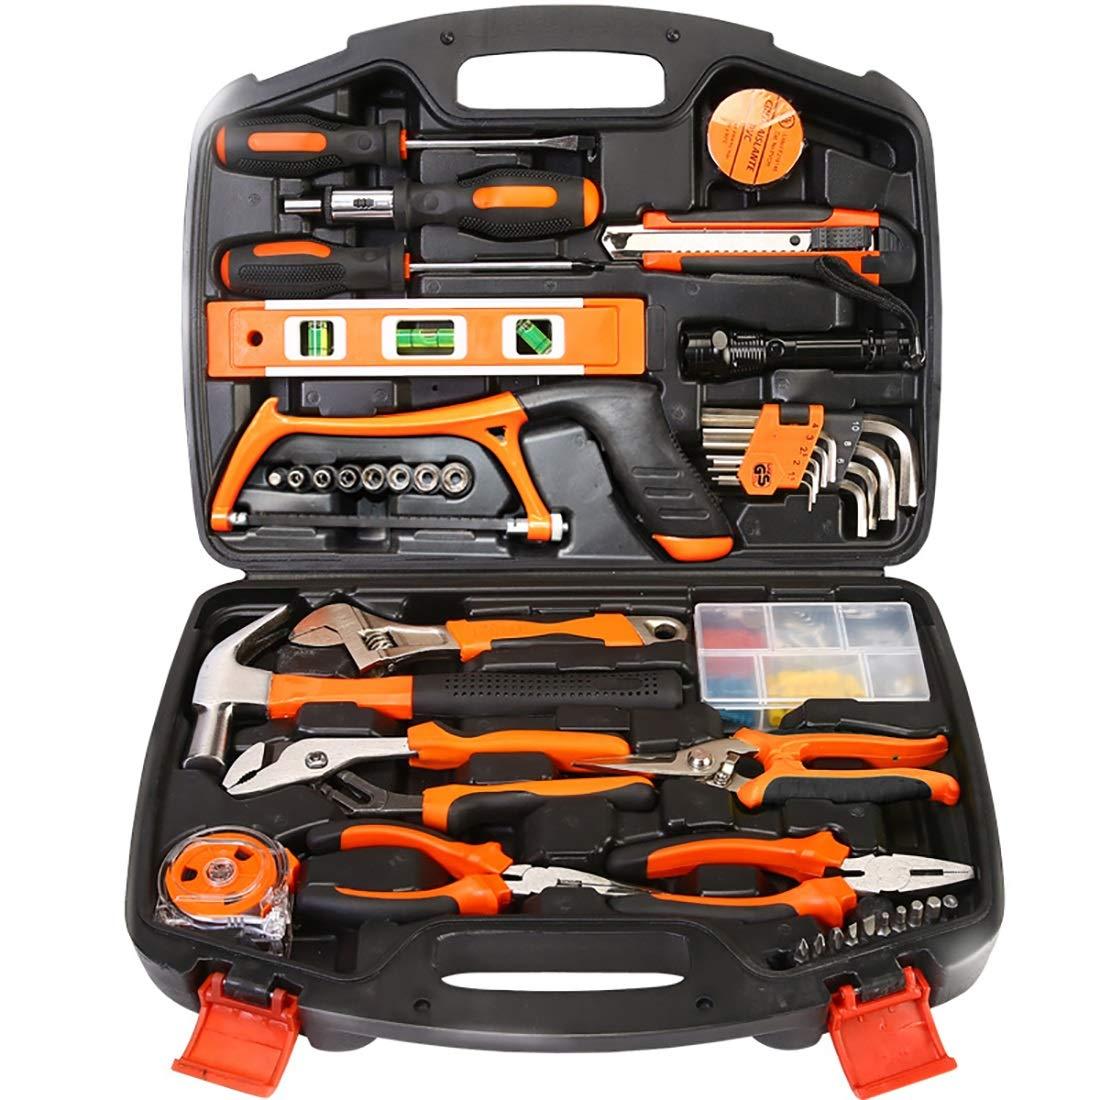 106-tlg. Haushaltswerkzeug-Kit Multifunktions-Auto-Hardware-Toolbox-Elektriker-Holzbearbeitung-Reparatur-Handbuch-Kombinationssatz. (Farbe   Orange) Orange